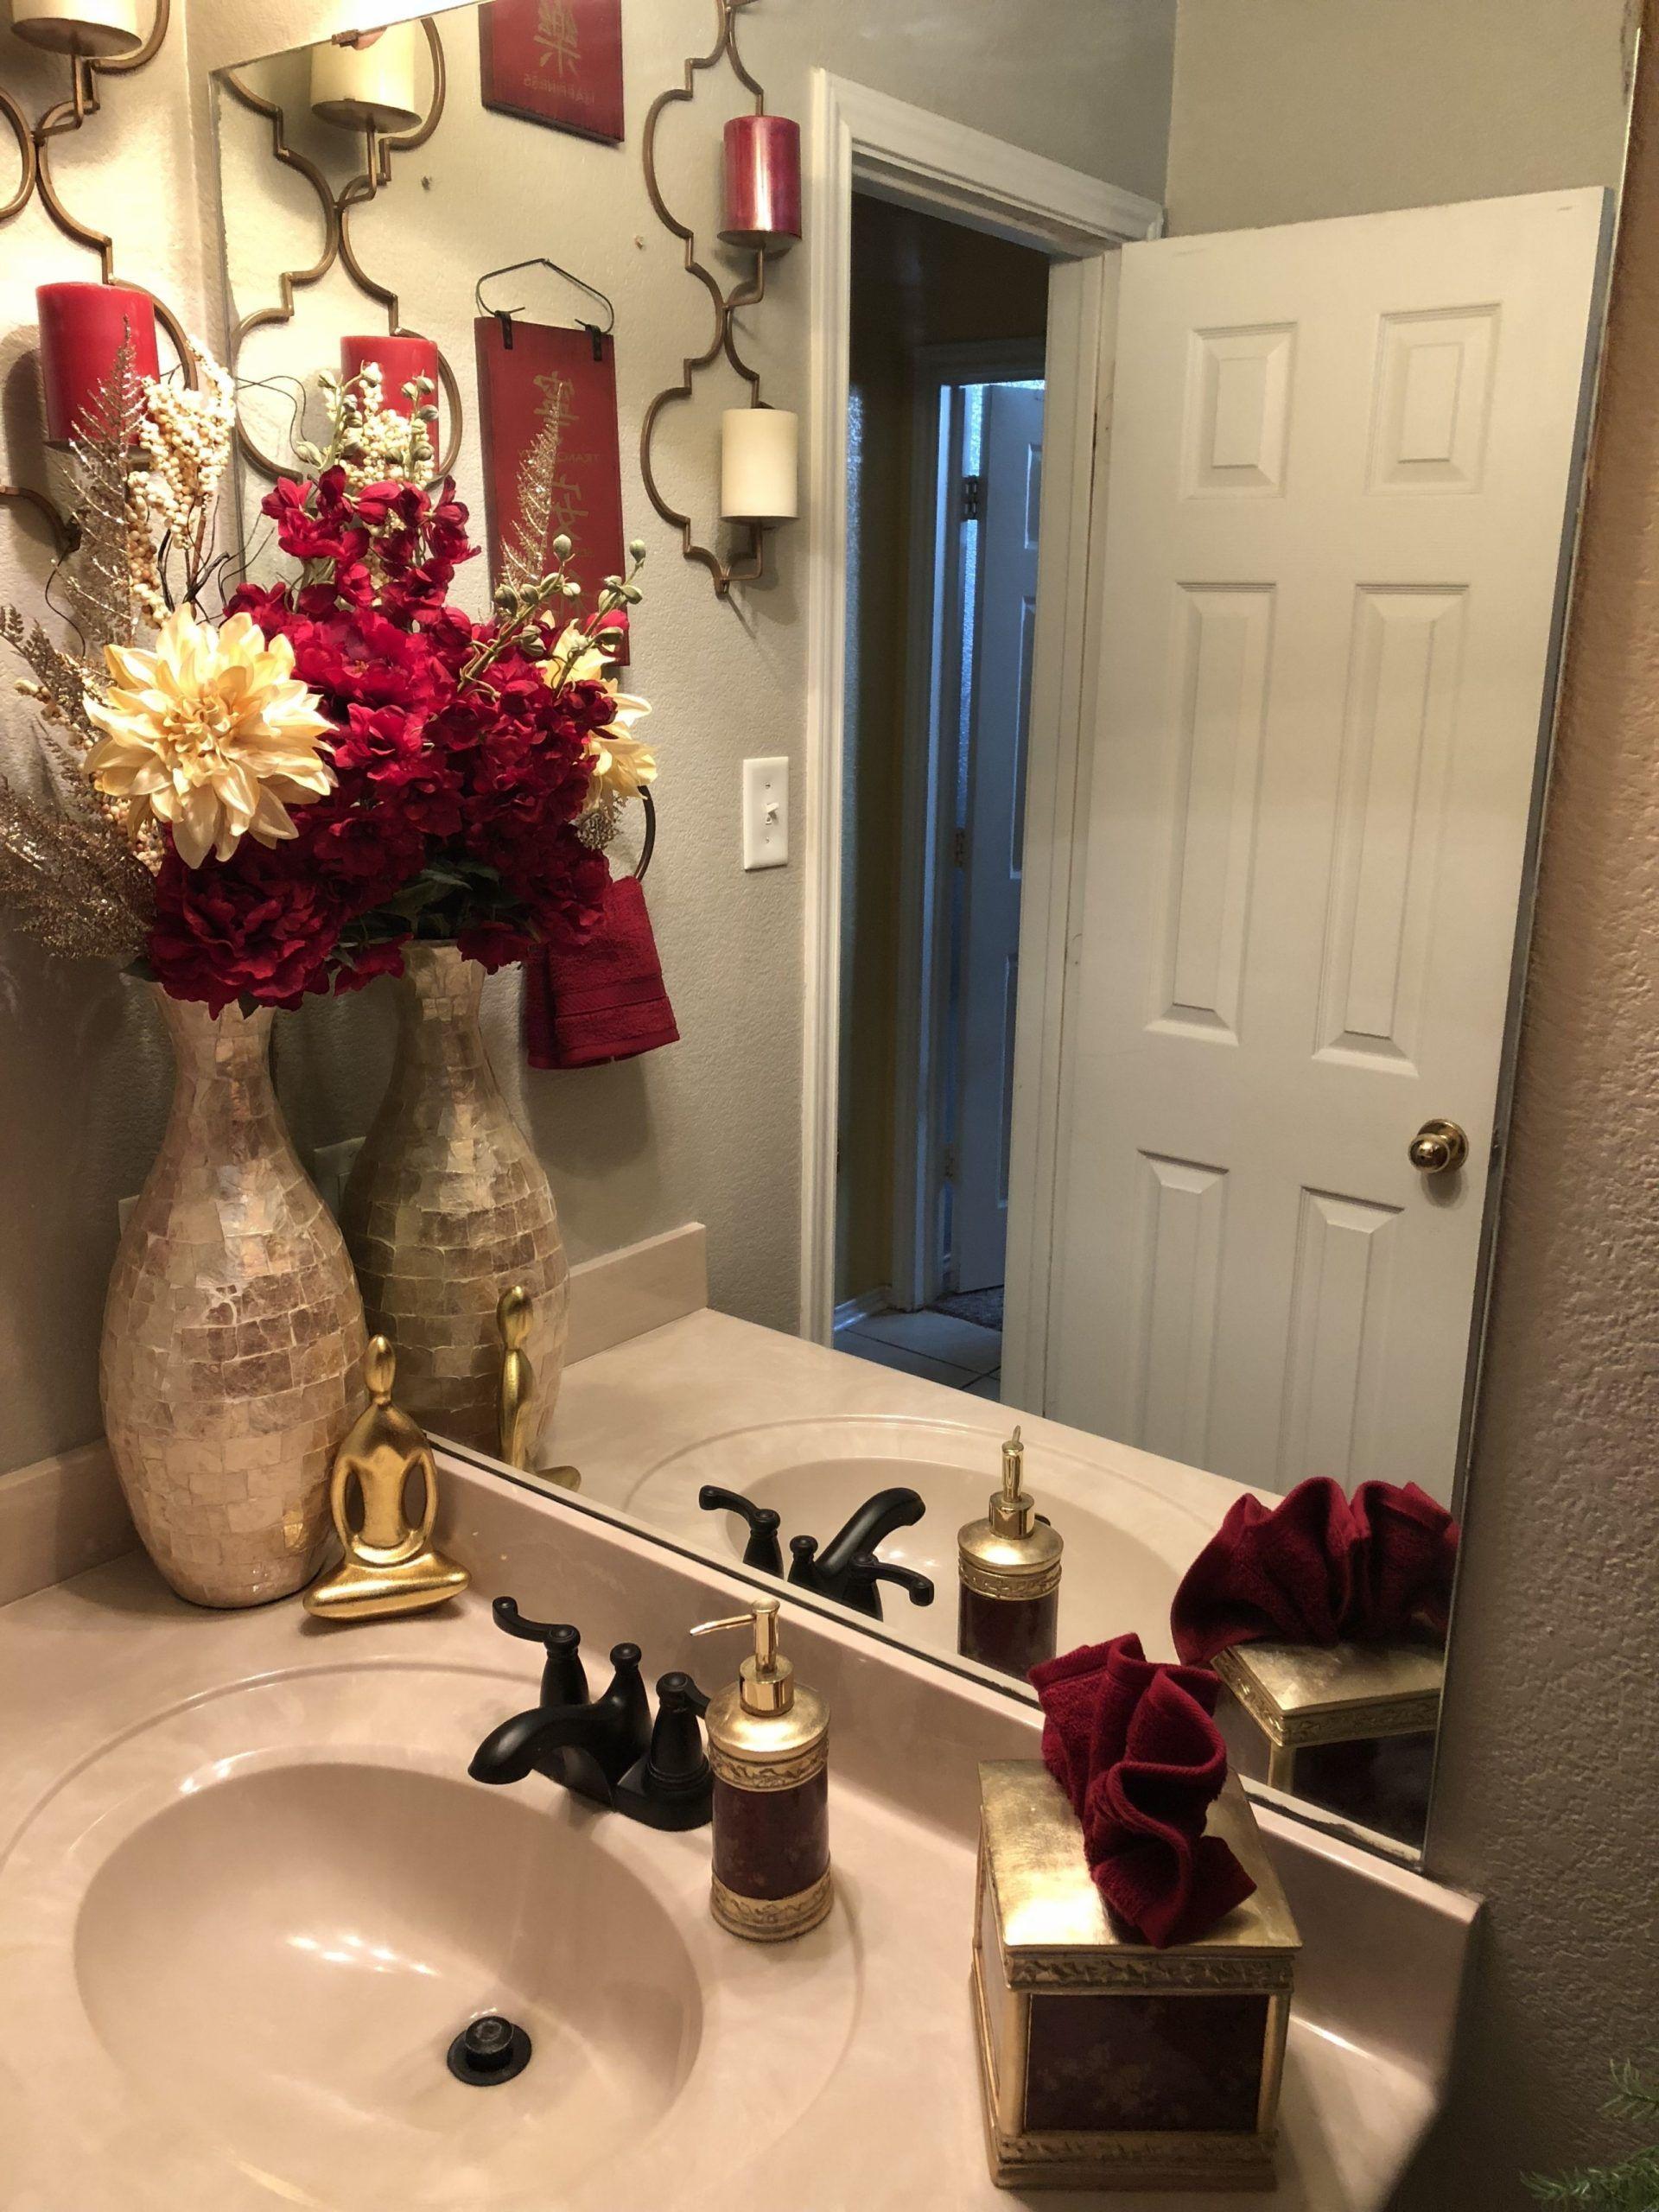 The 10 Best Christmas Bathroom Decorations Christmas Bathroom Decor Christmas Bathroom Small Bathroom Decor